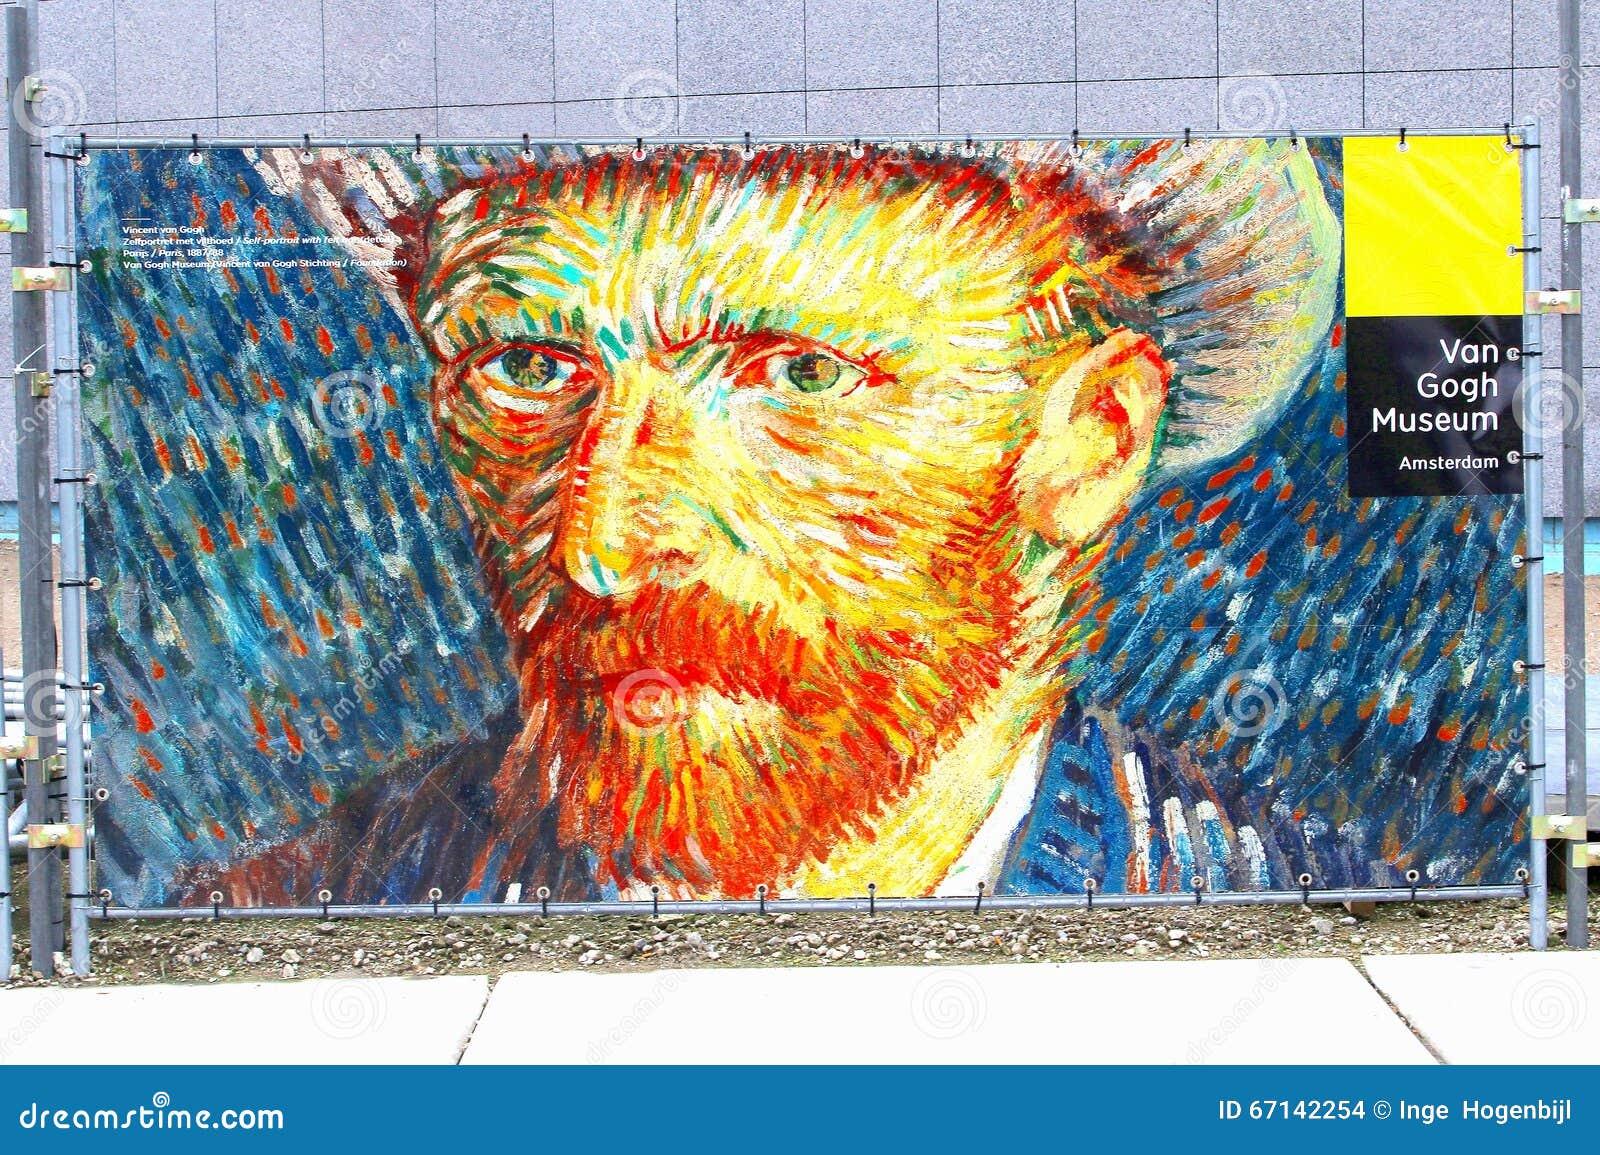 Self Portrait Vincent Van Gogh Museum Sign Amsterdam